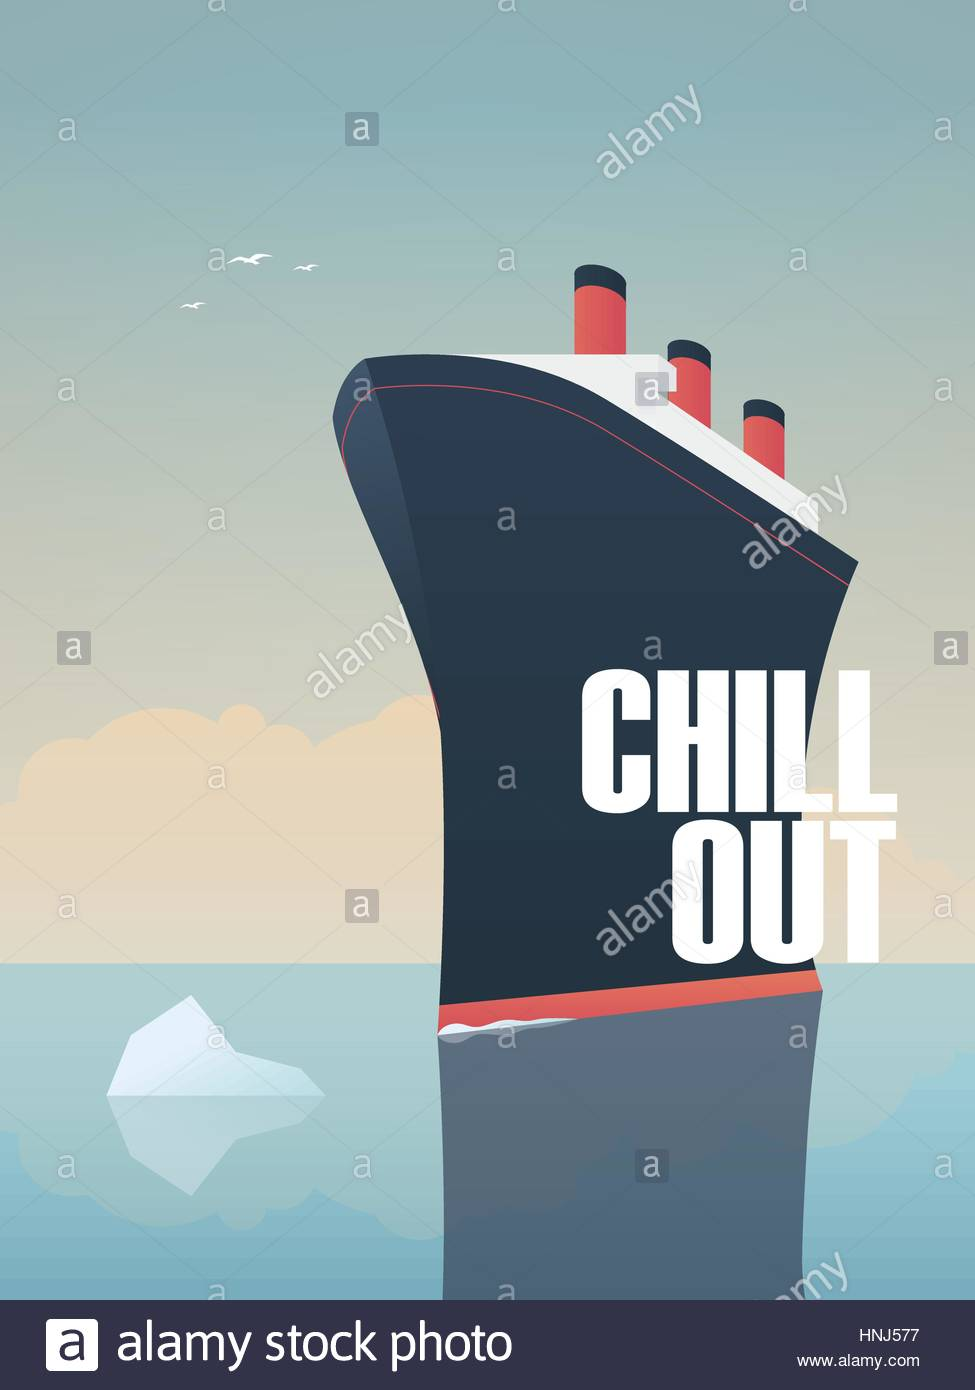 Big ship sailing on sea with iceberg in its way symbol of relax big ship sailing on sea with iceberg in its way symbol of relax and calm holiday buycottarizona